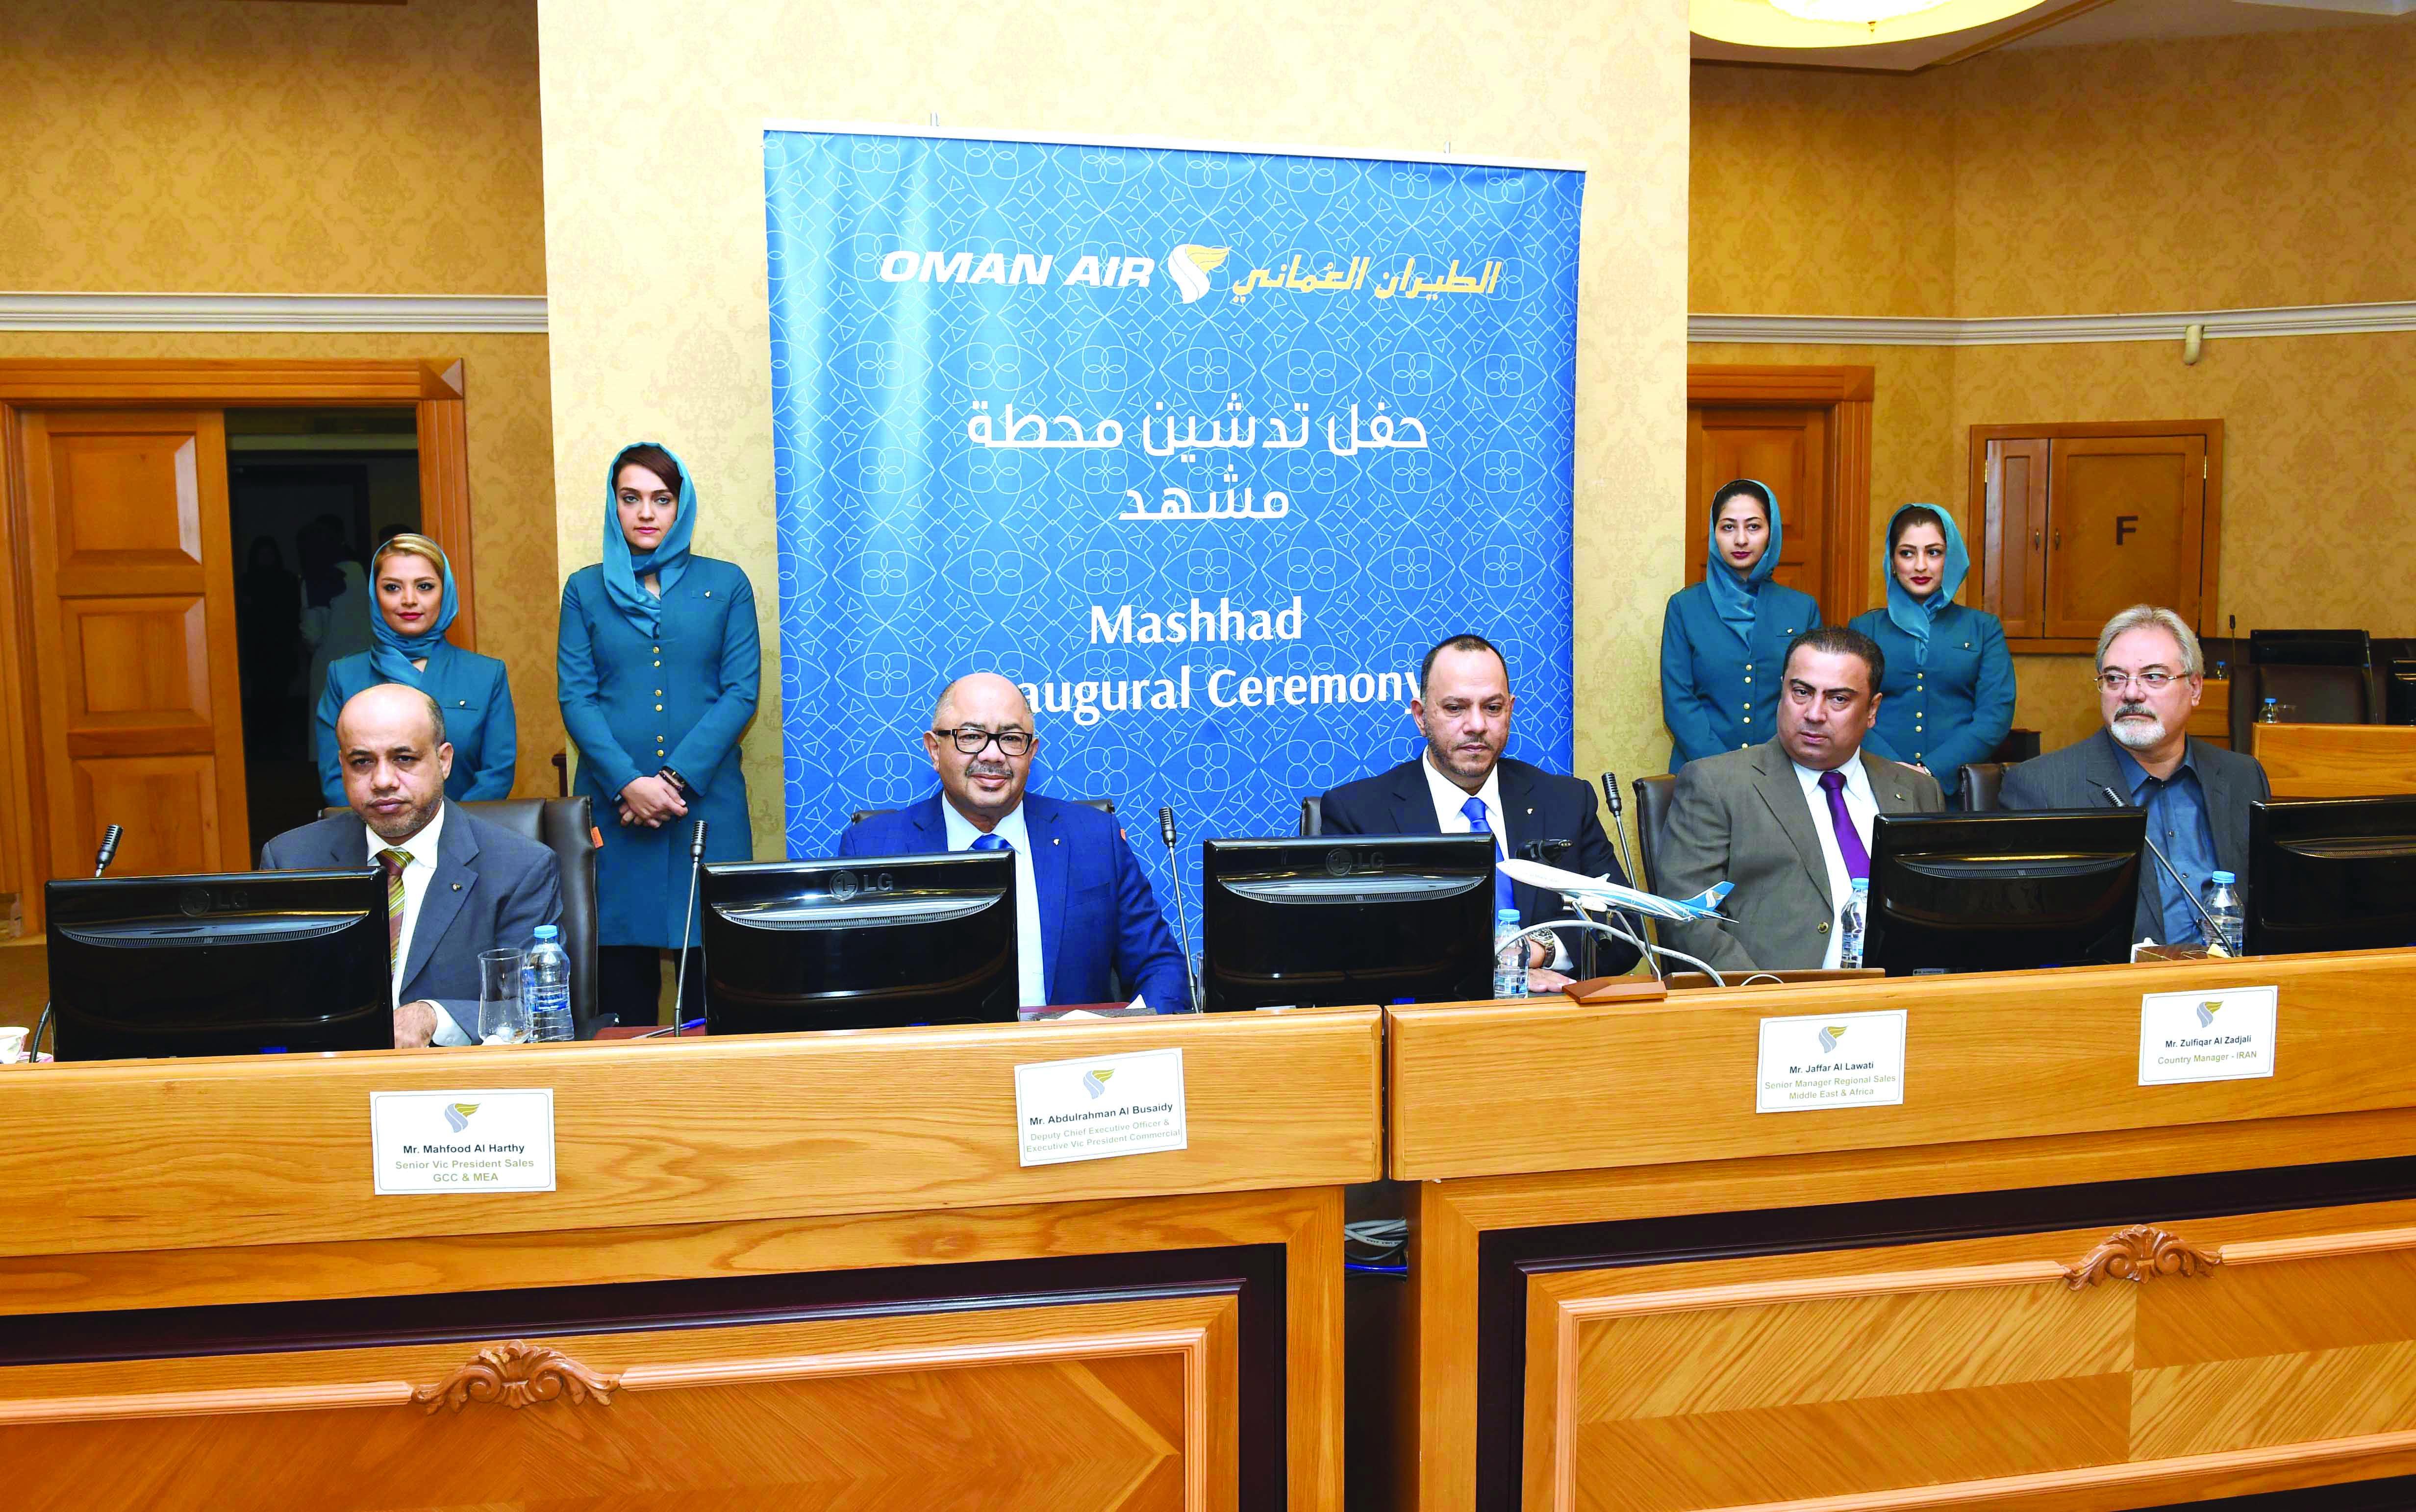 Oman Air boosts bond with flight to Mashhad